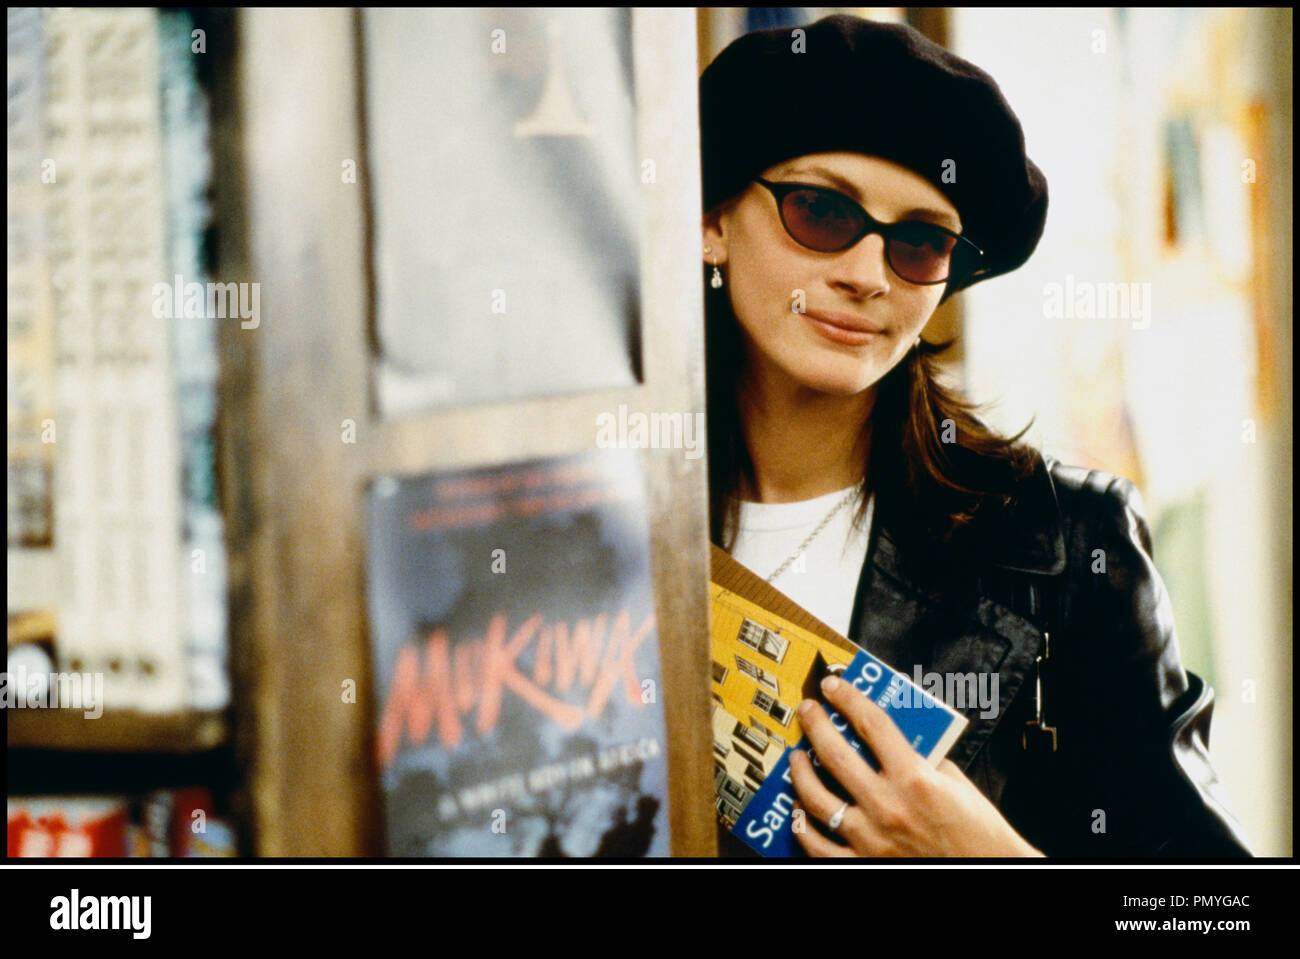 Prod DB © PolyGram/Working Title / DR COUP DE FOUDRE A NOTTING HILL (NOTTING HILL) de Roger Michell 1999 GB avec Julia Roberts beret, lunettes, cacher, discretion - Stock Image